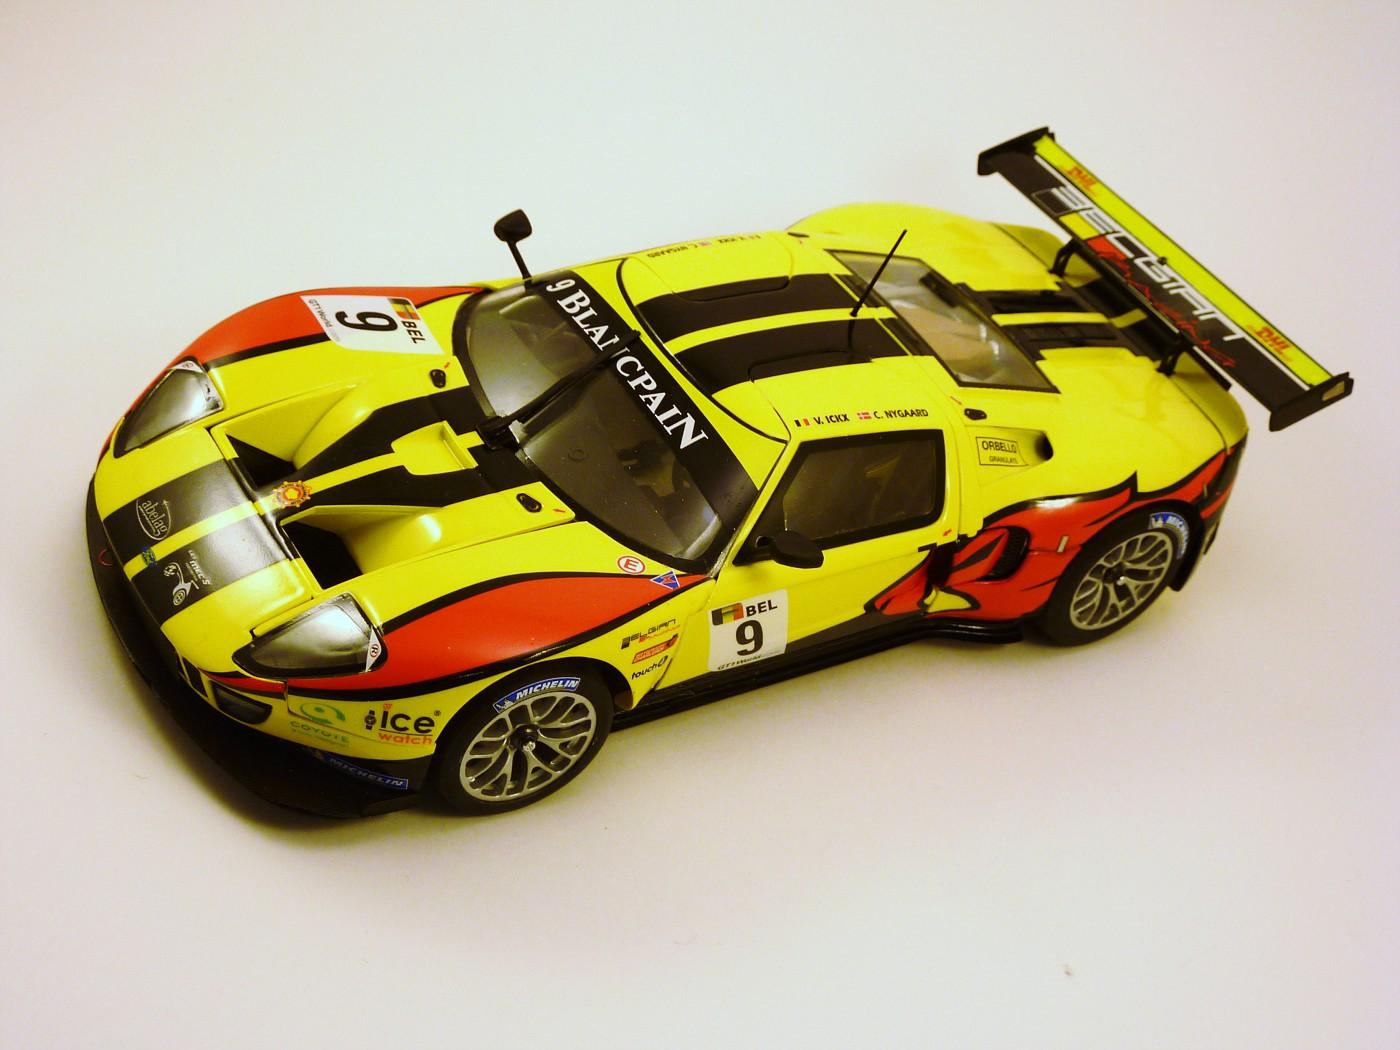 Ford gt1 Belgian racing FinalesFordGt1BelgianRacing001-vi